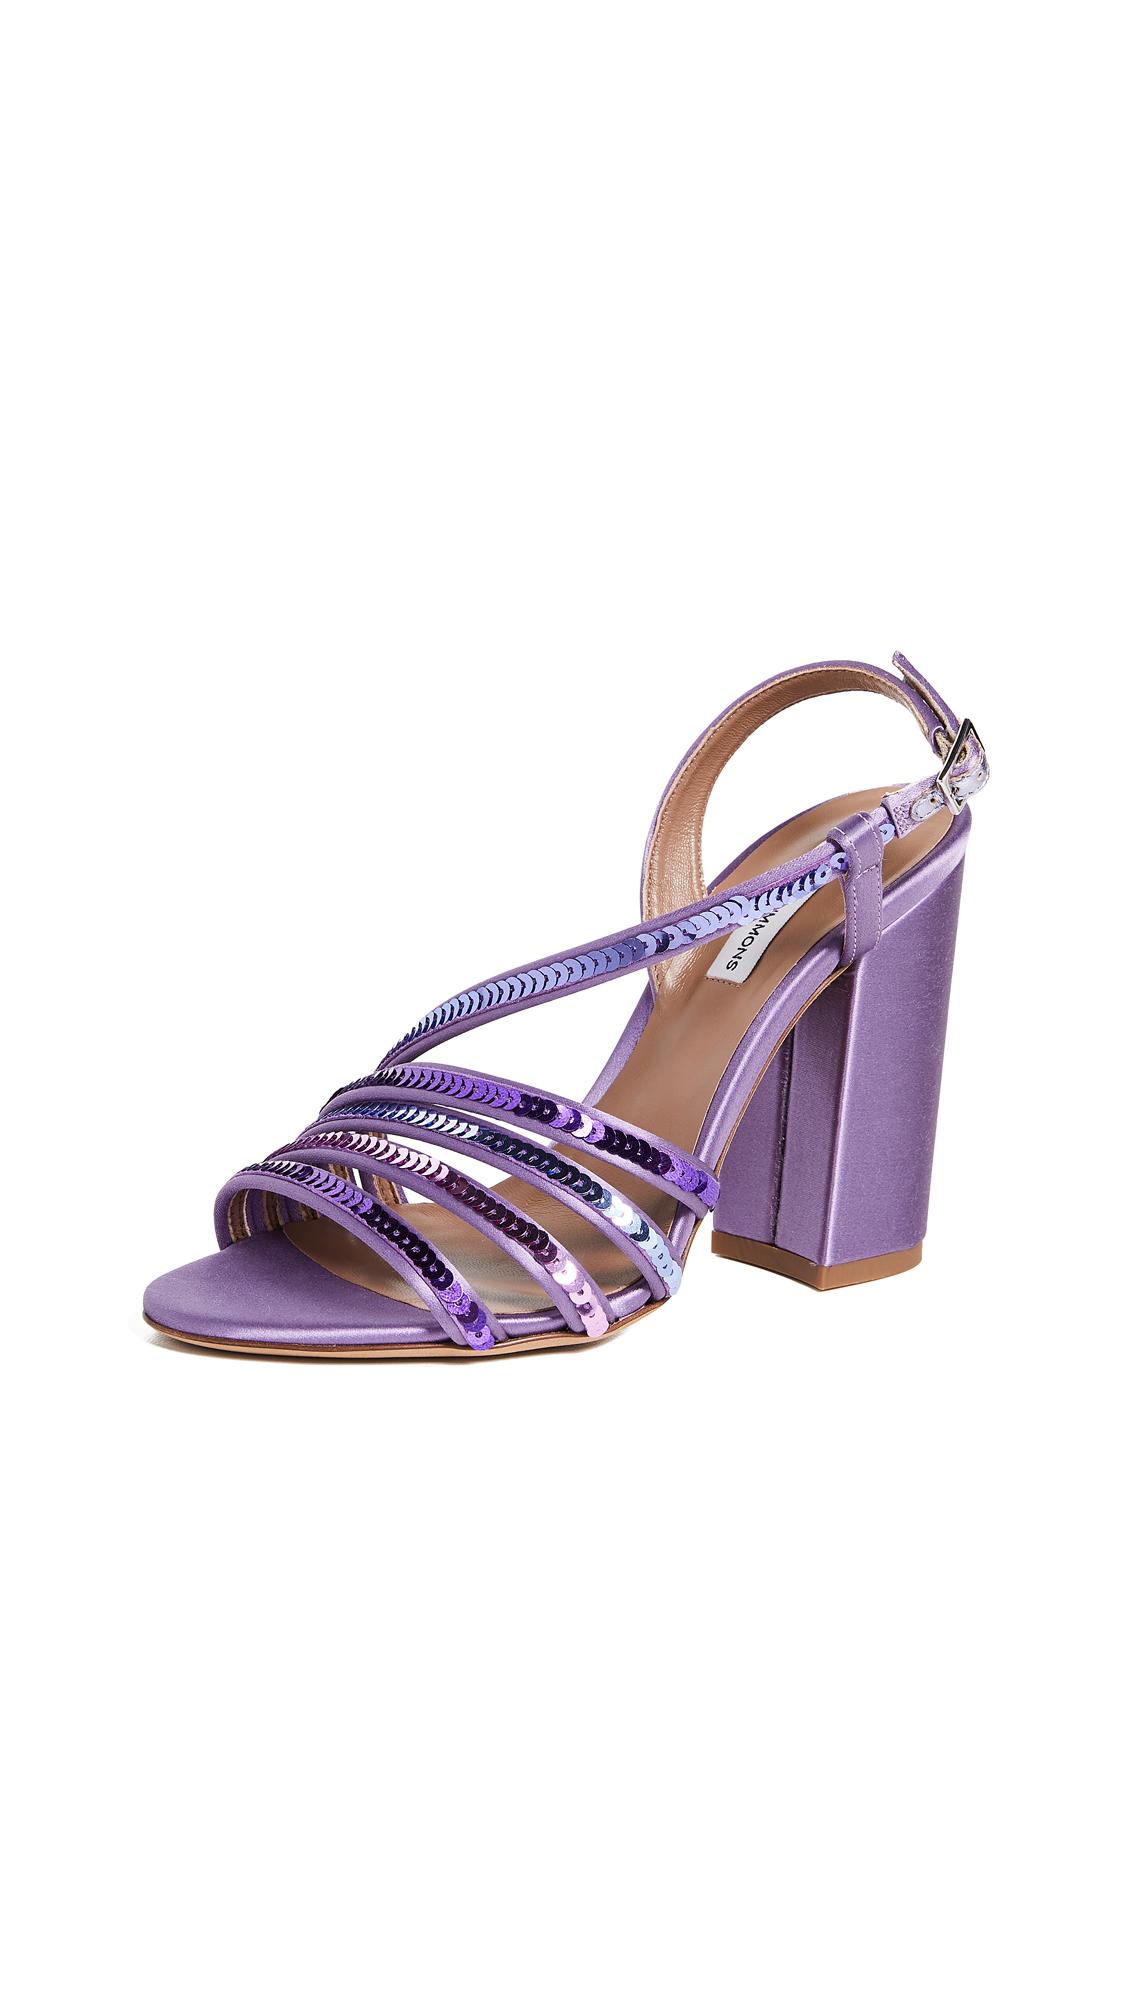 Tabitha Simmons Viola Sandals - Lavender